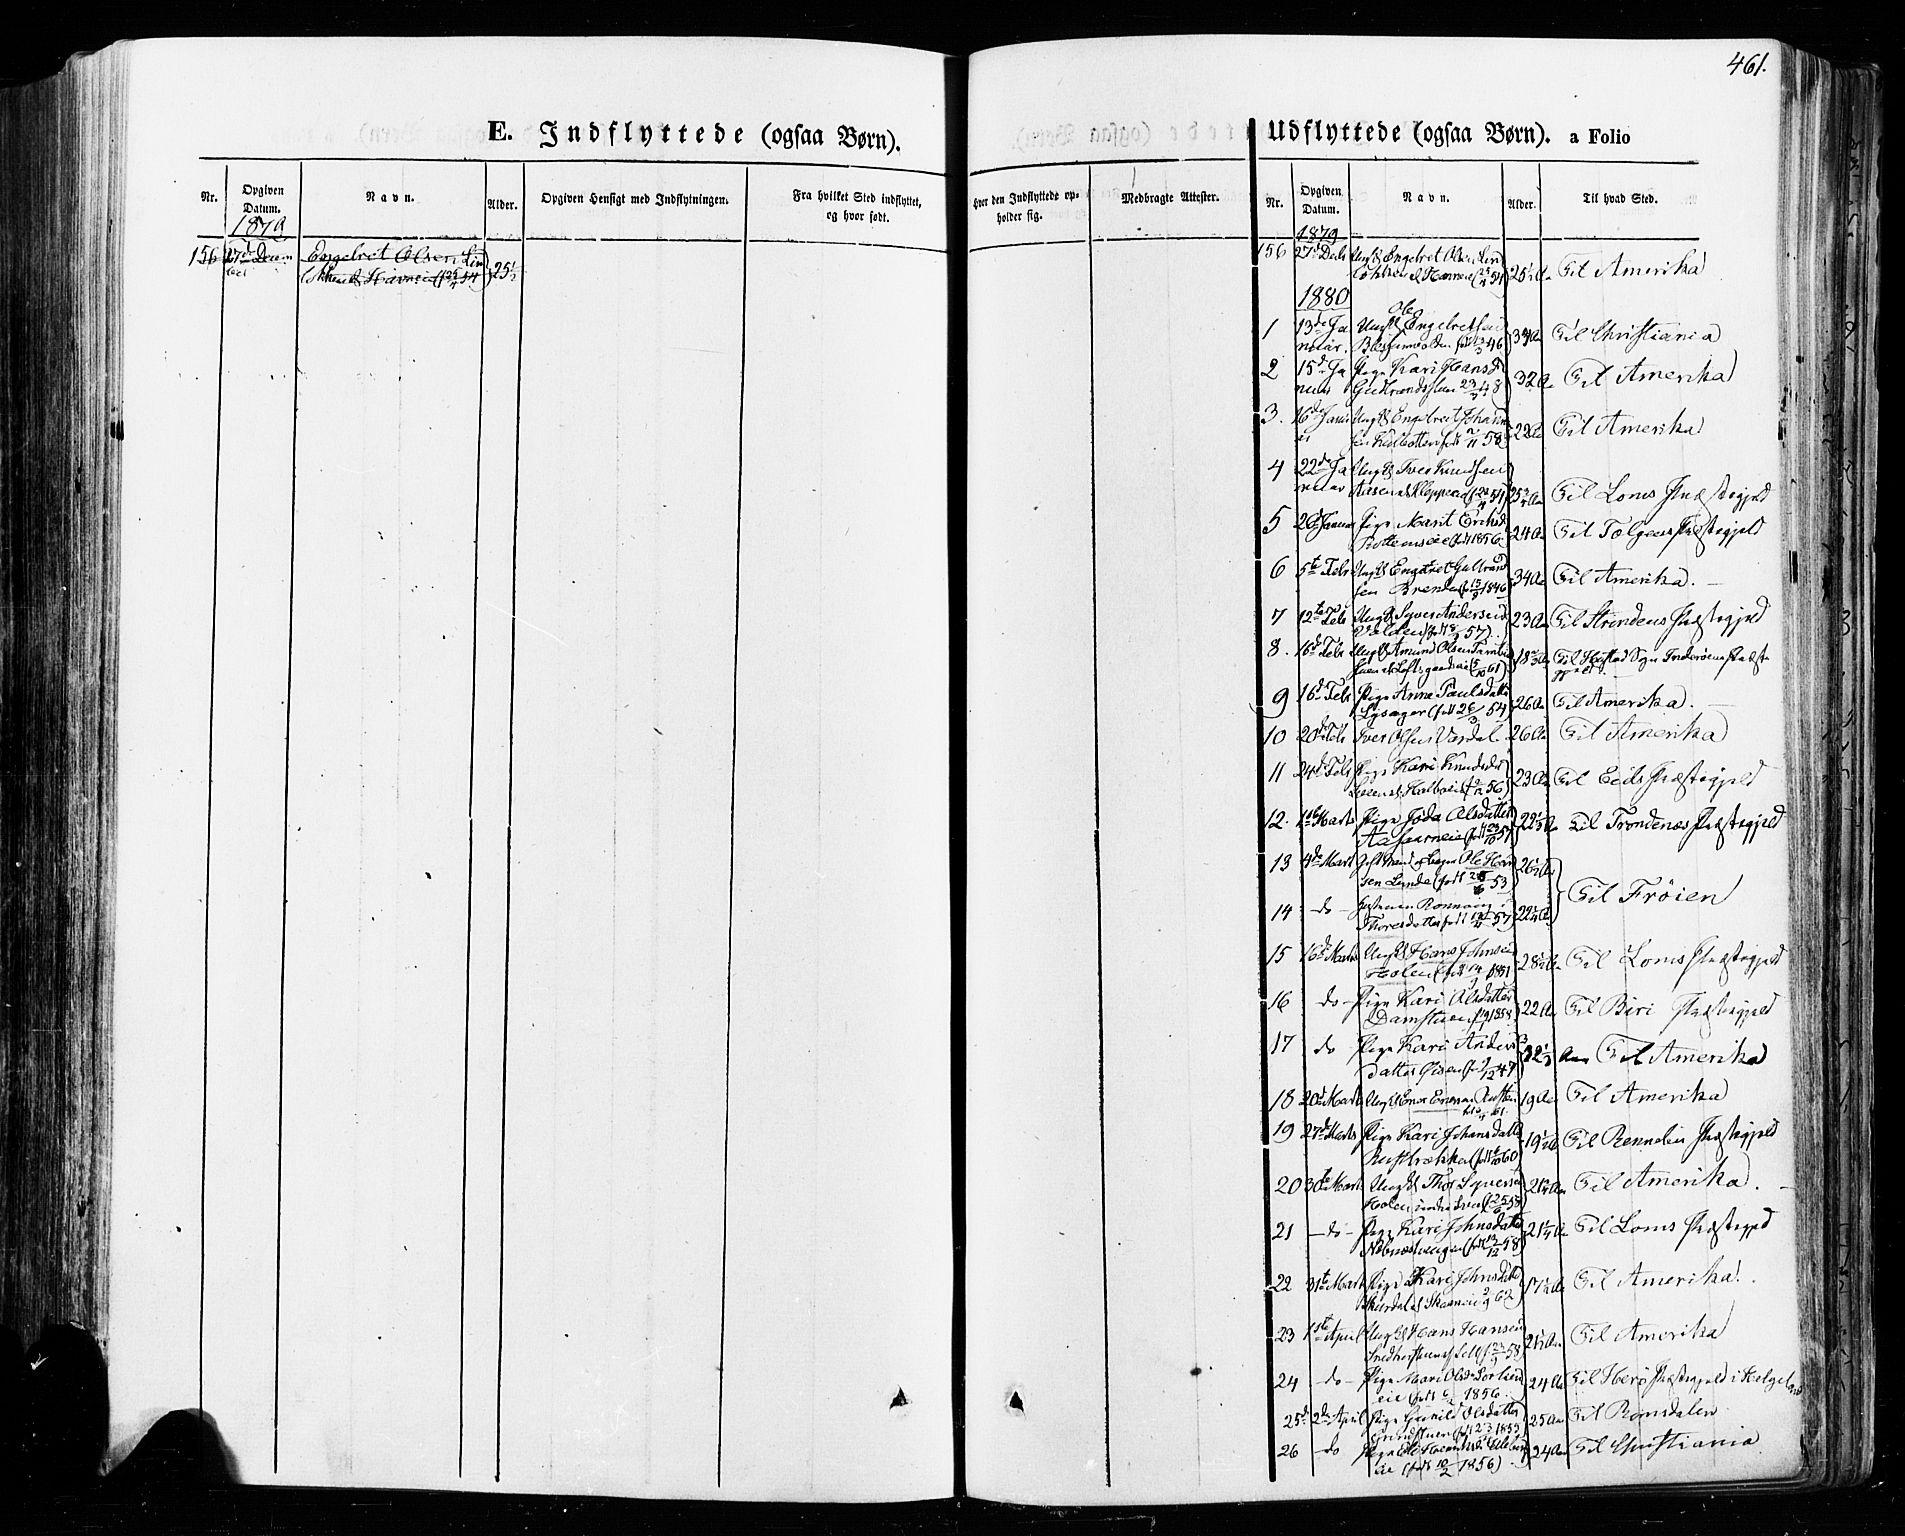 SAH, Vågå prestekontor, Ministerialbok nr. 7 /1, 1872-1886, s. 461